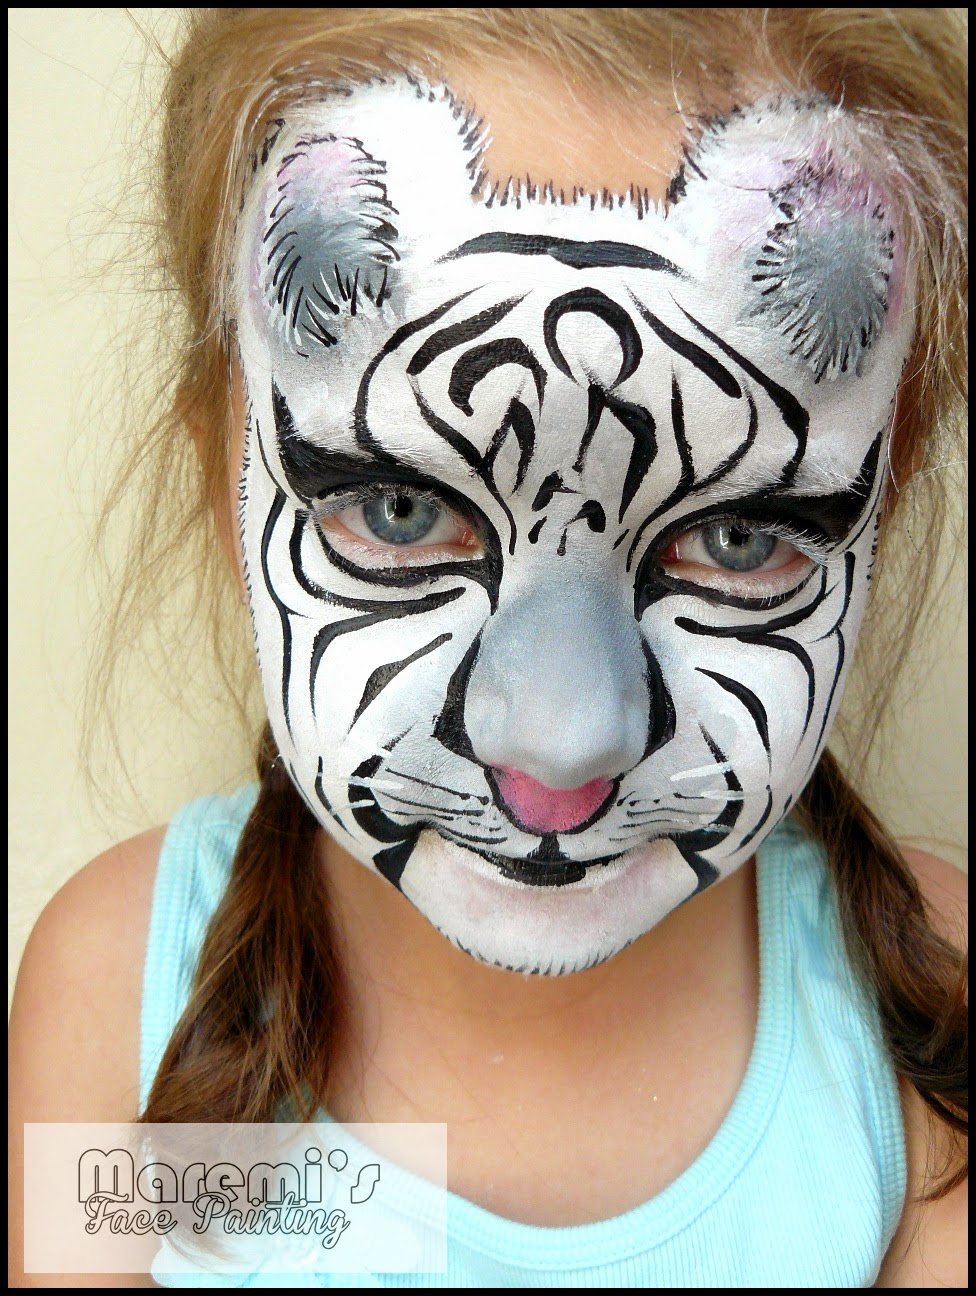 Maremi S Face And Body Painting Malowanie Twarzy Dzieci Bialy Tygrys Face Painting For Kids White Tiger